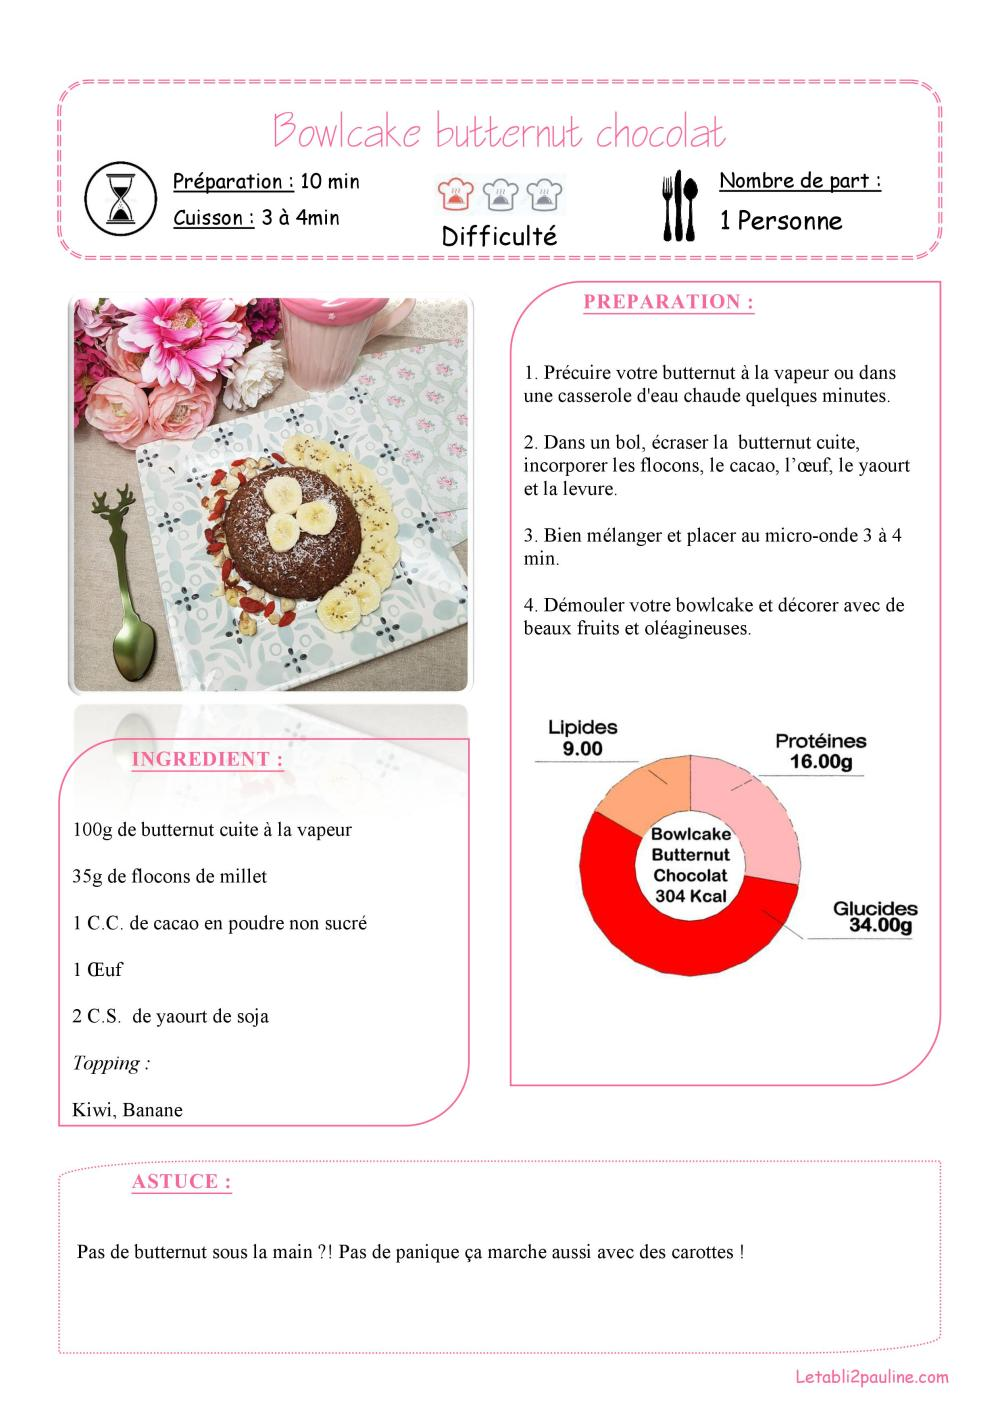 Fiche recette simple Bowlcake butternut chocolat